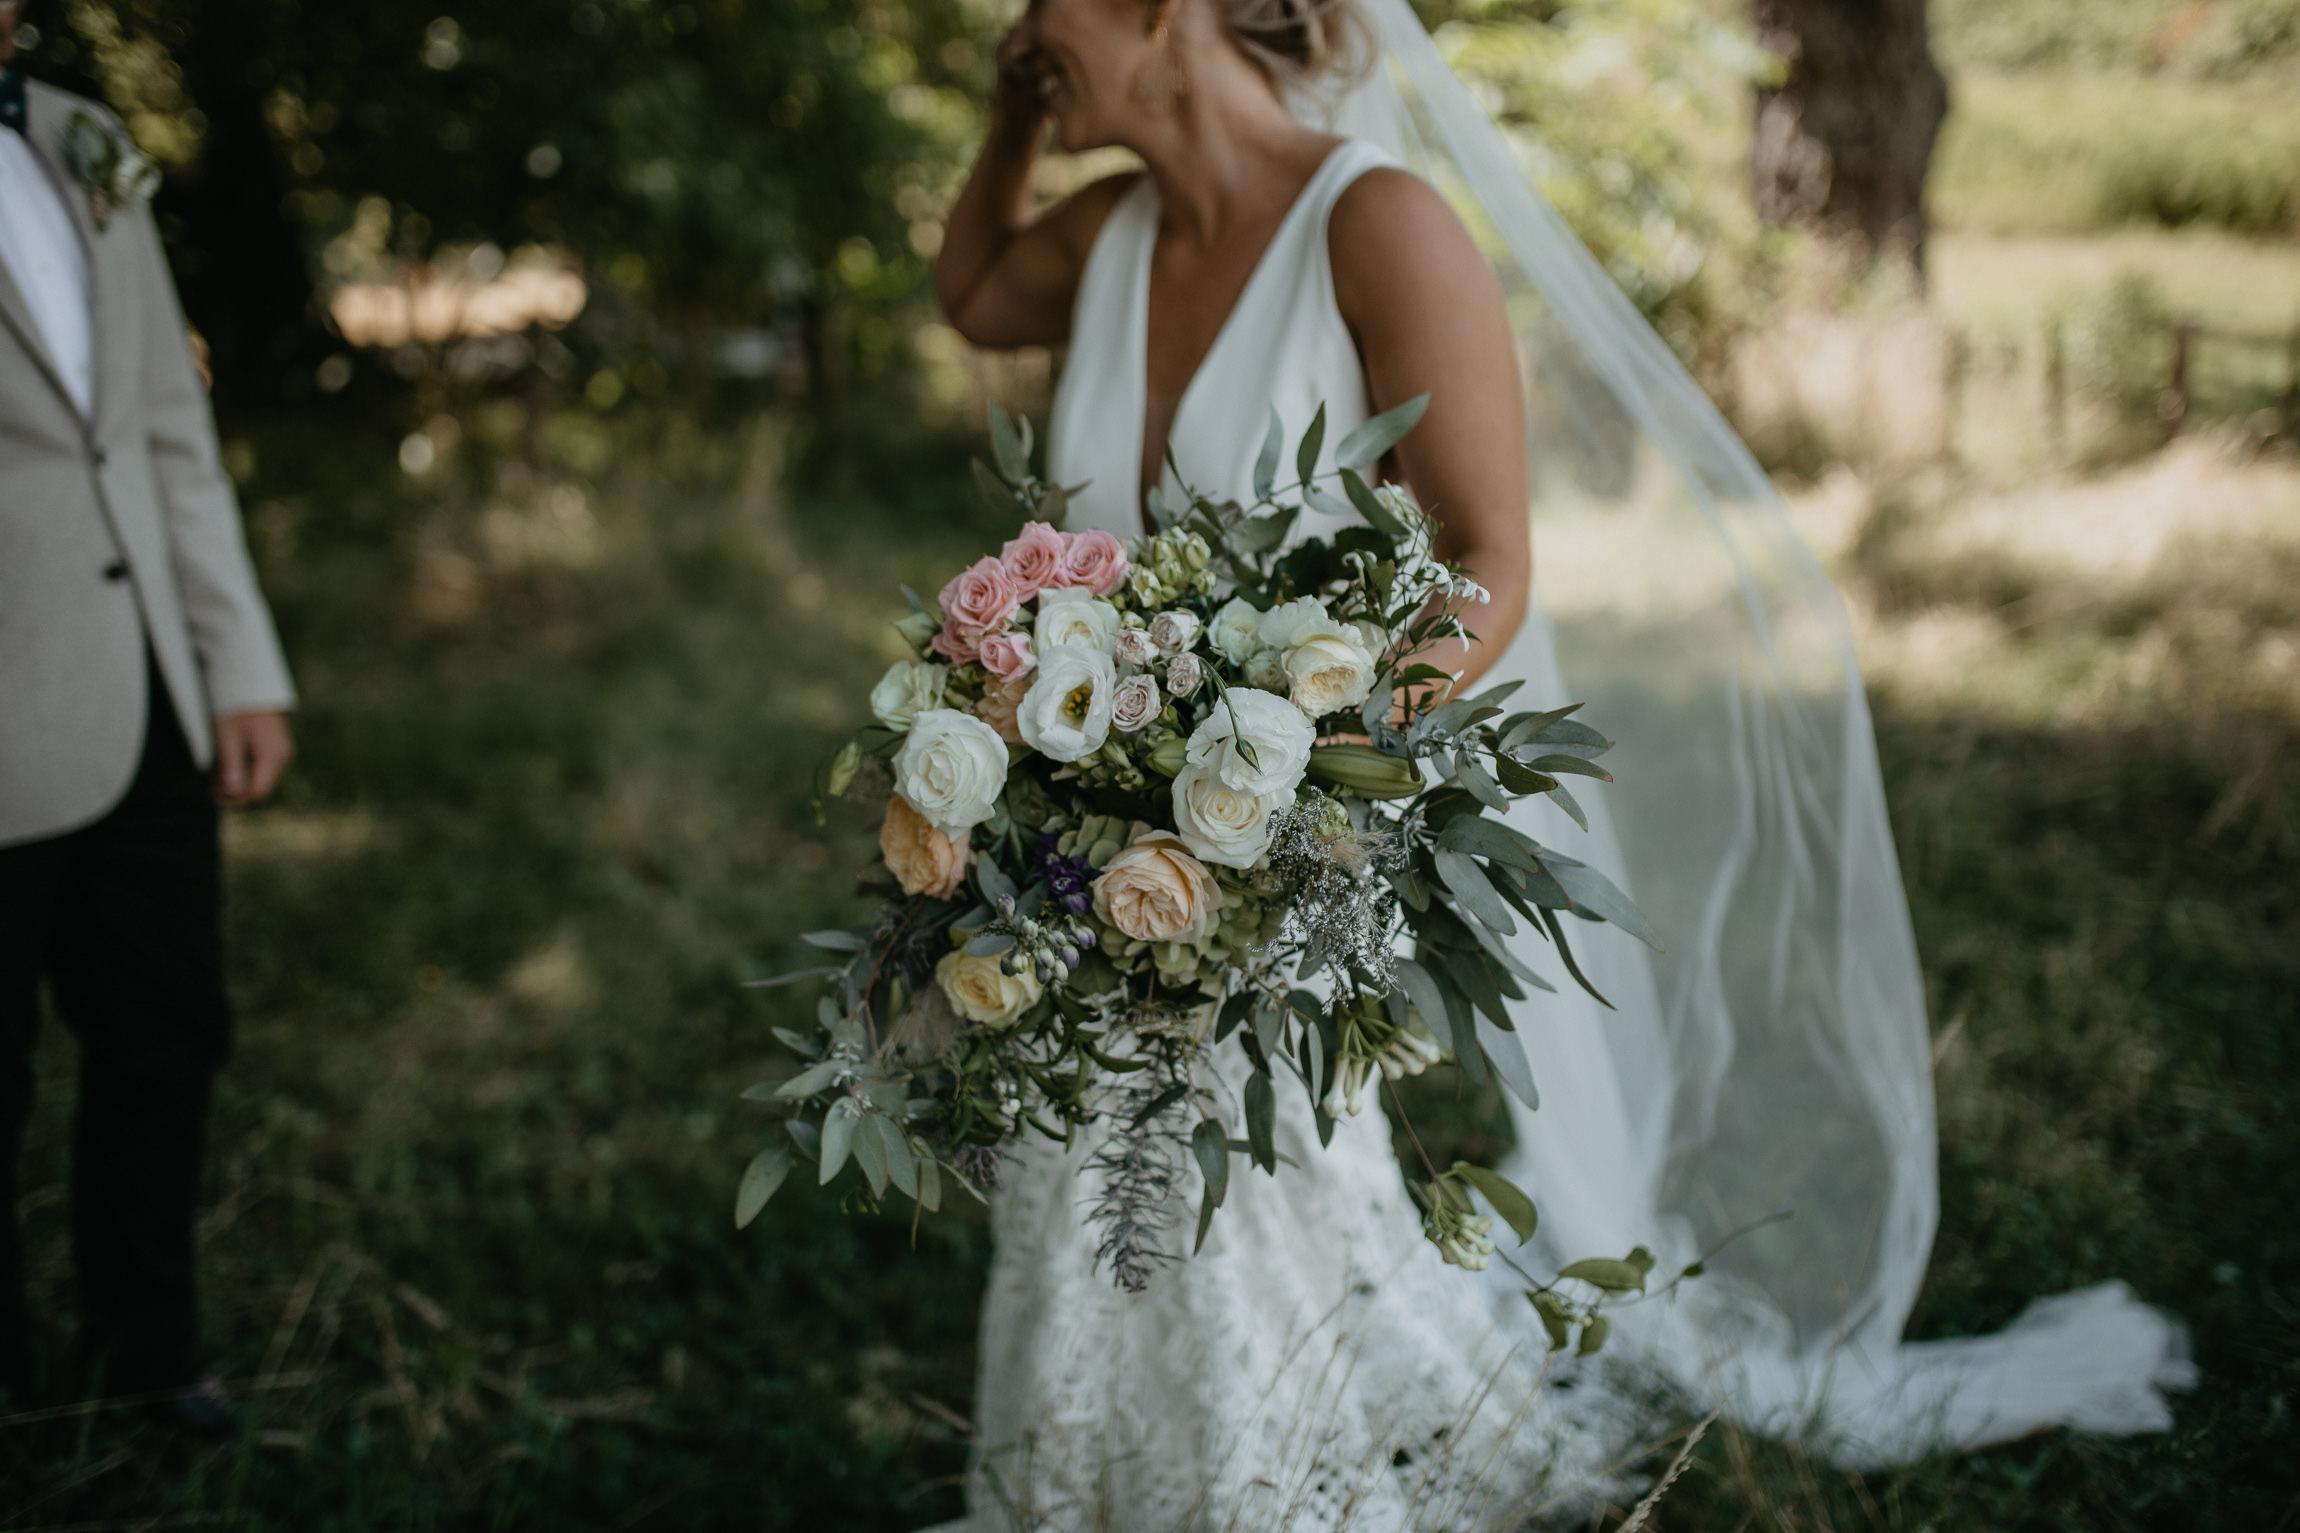 oldforestschool-wedding-blog-57.jpg